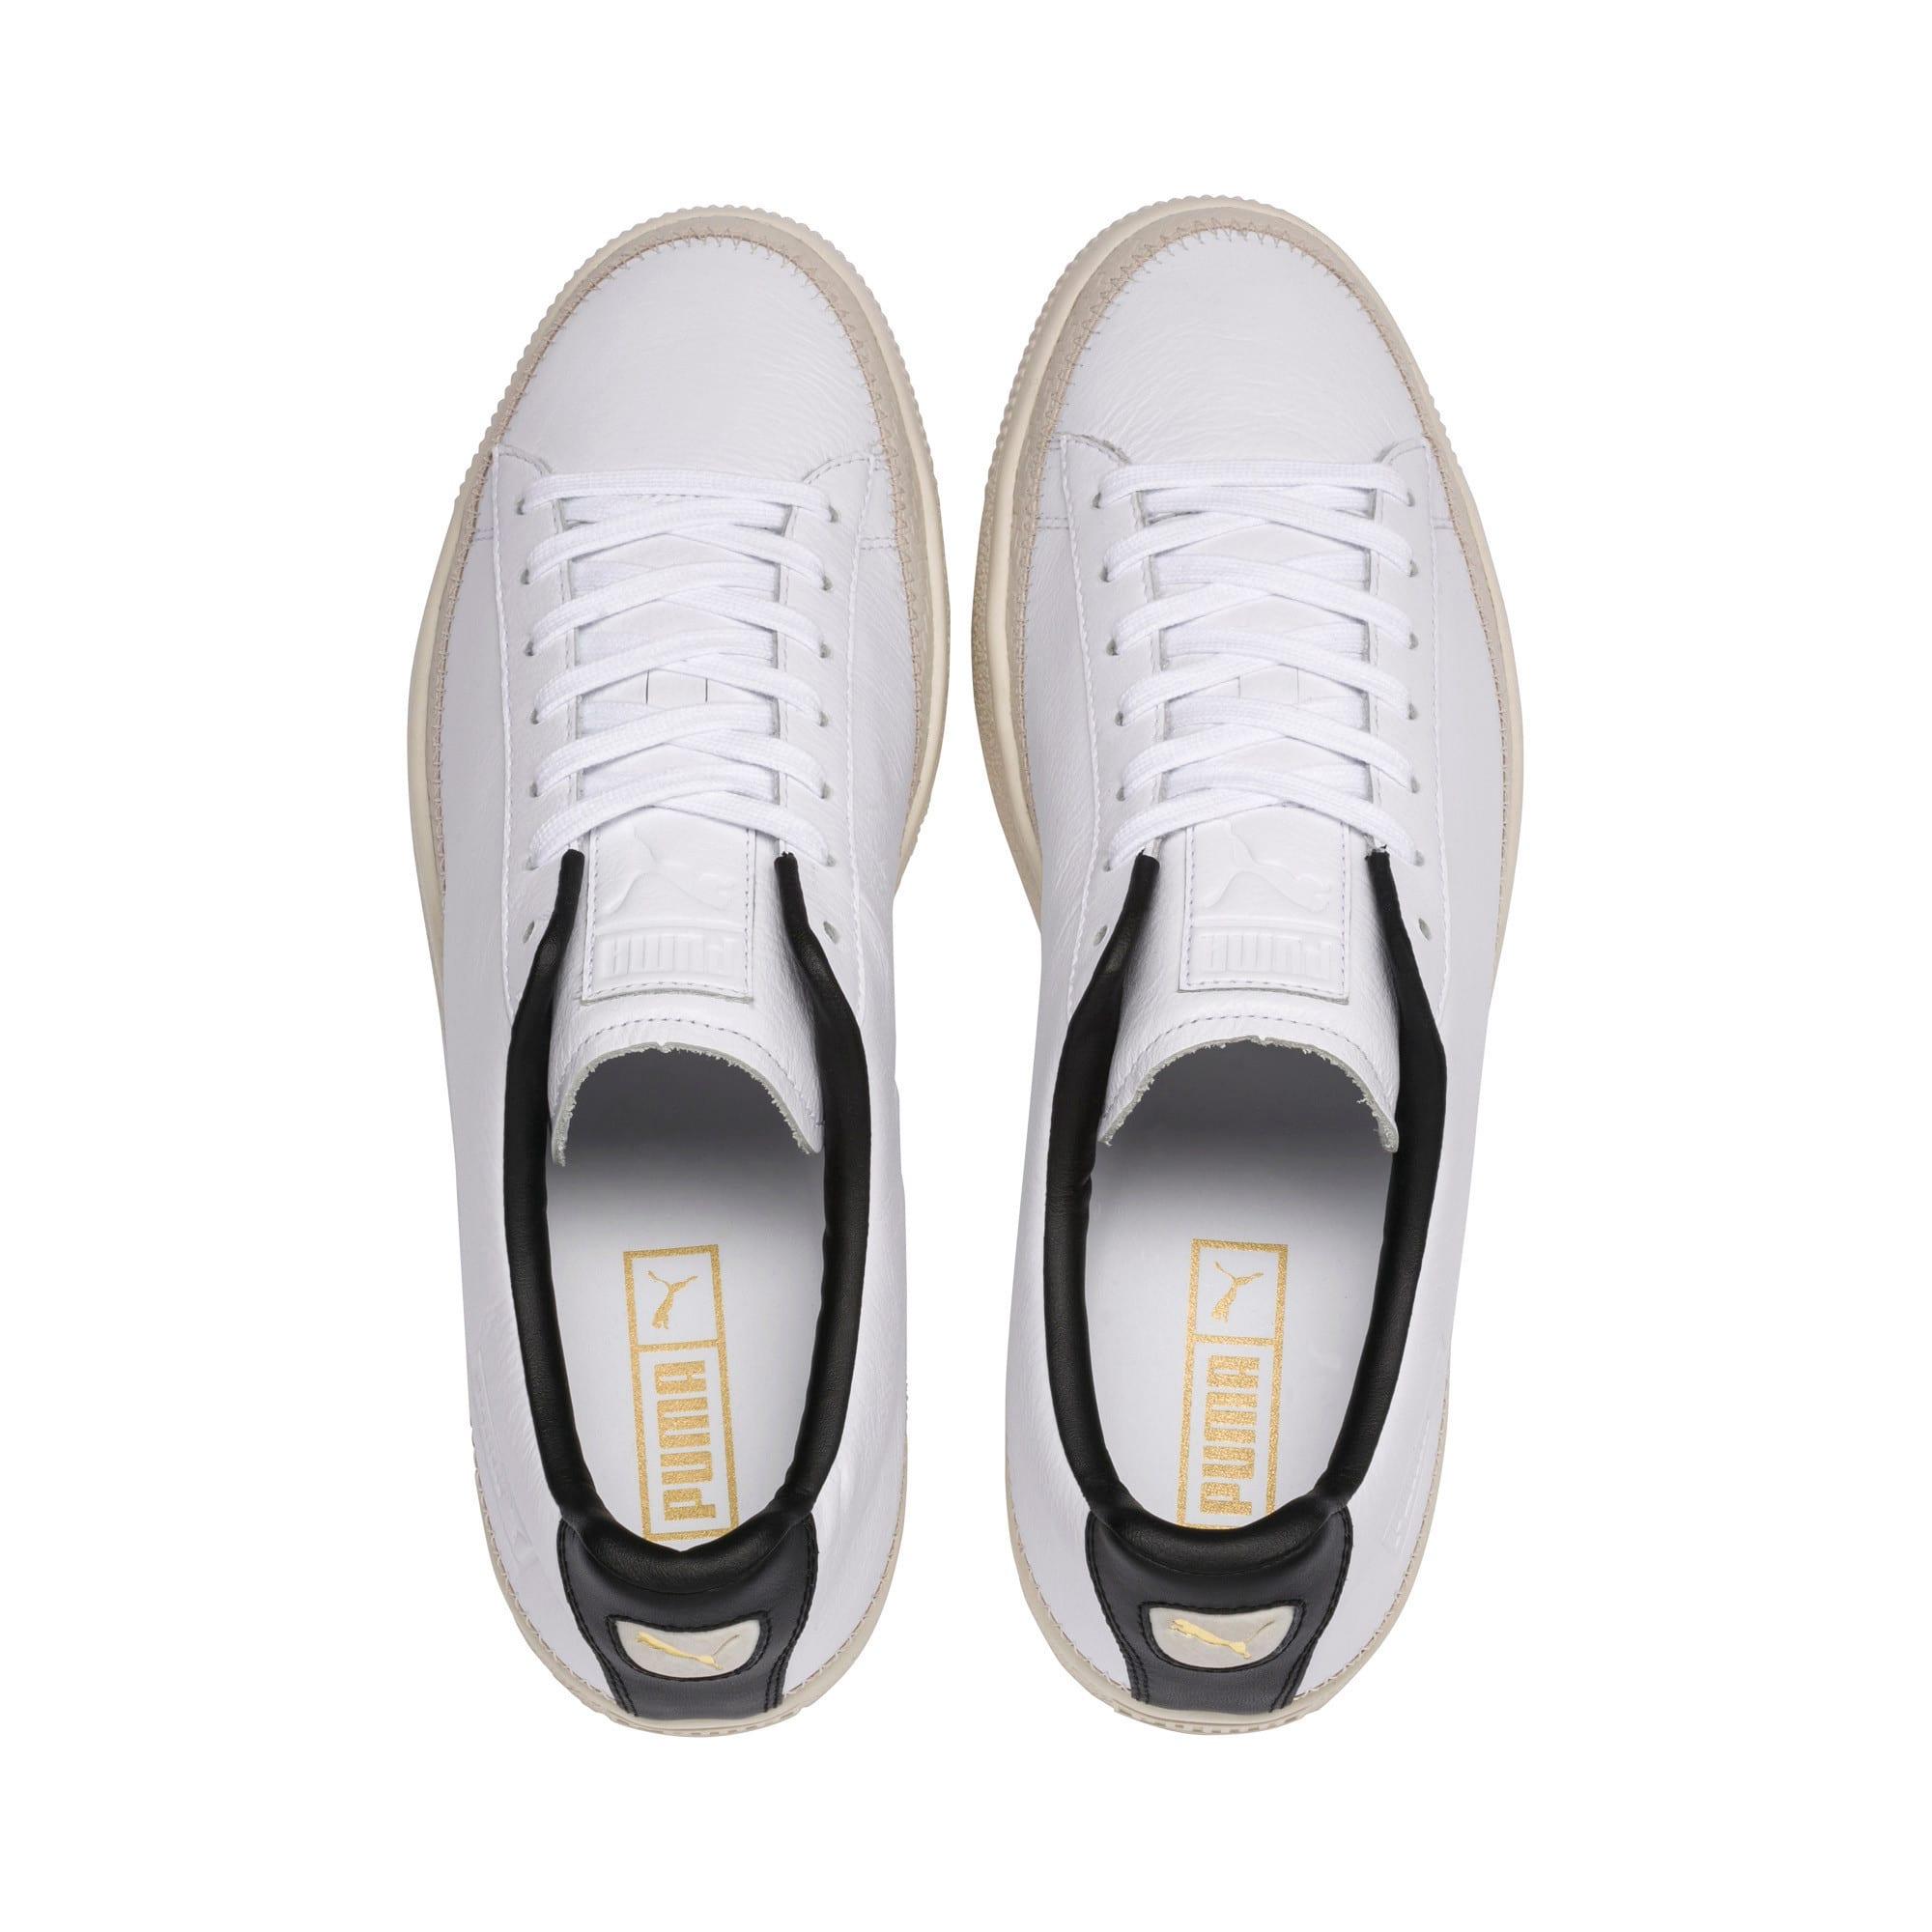 Thumbnail 6 of Basket Trim Shoes, Puma White-Whisper W-Black, medium-IND